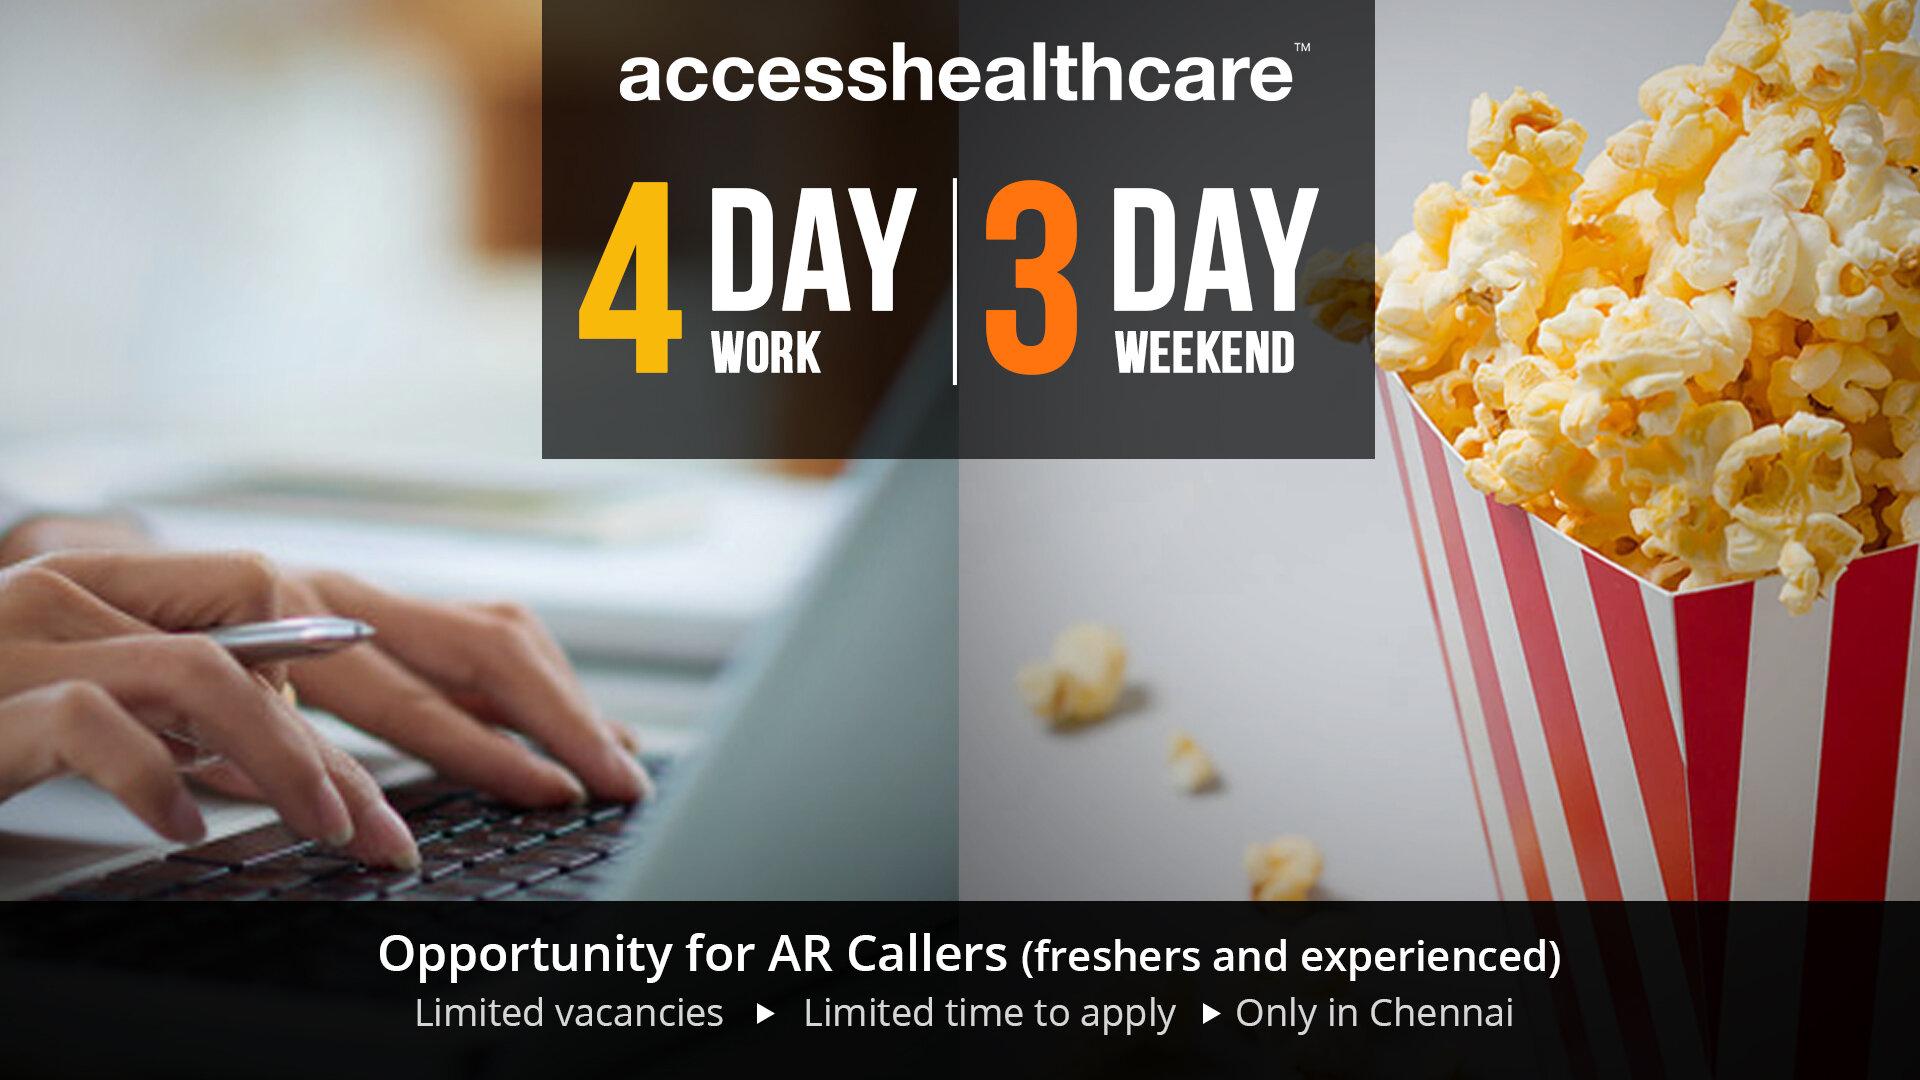 AR_Callers_4_Days_Work_Chennai